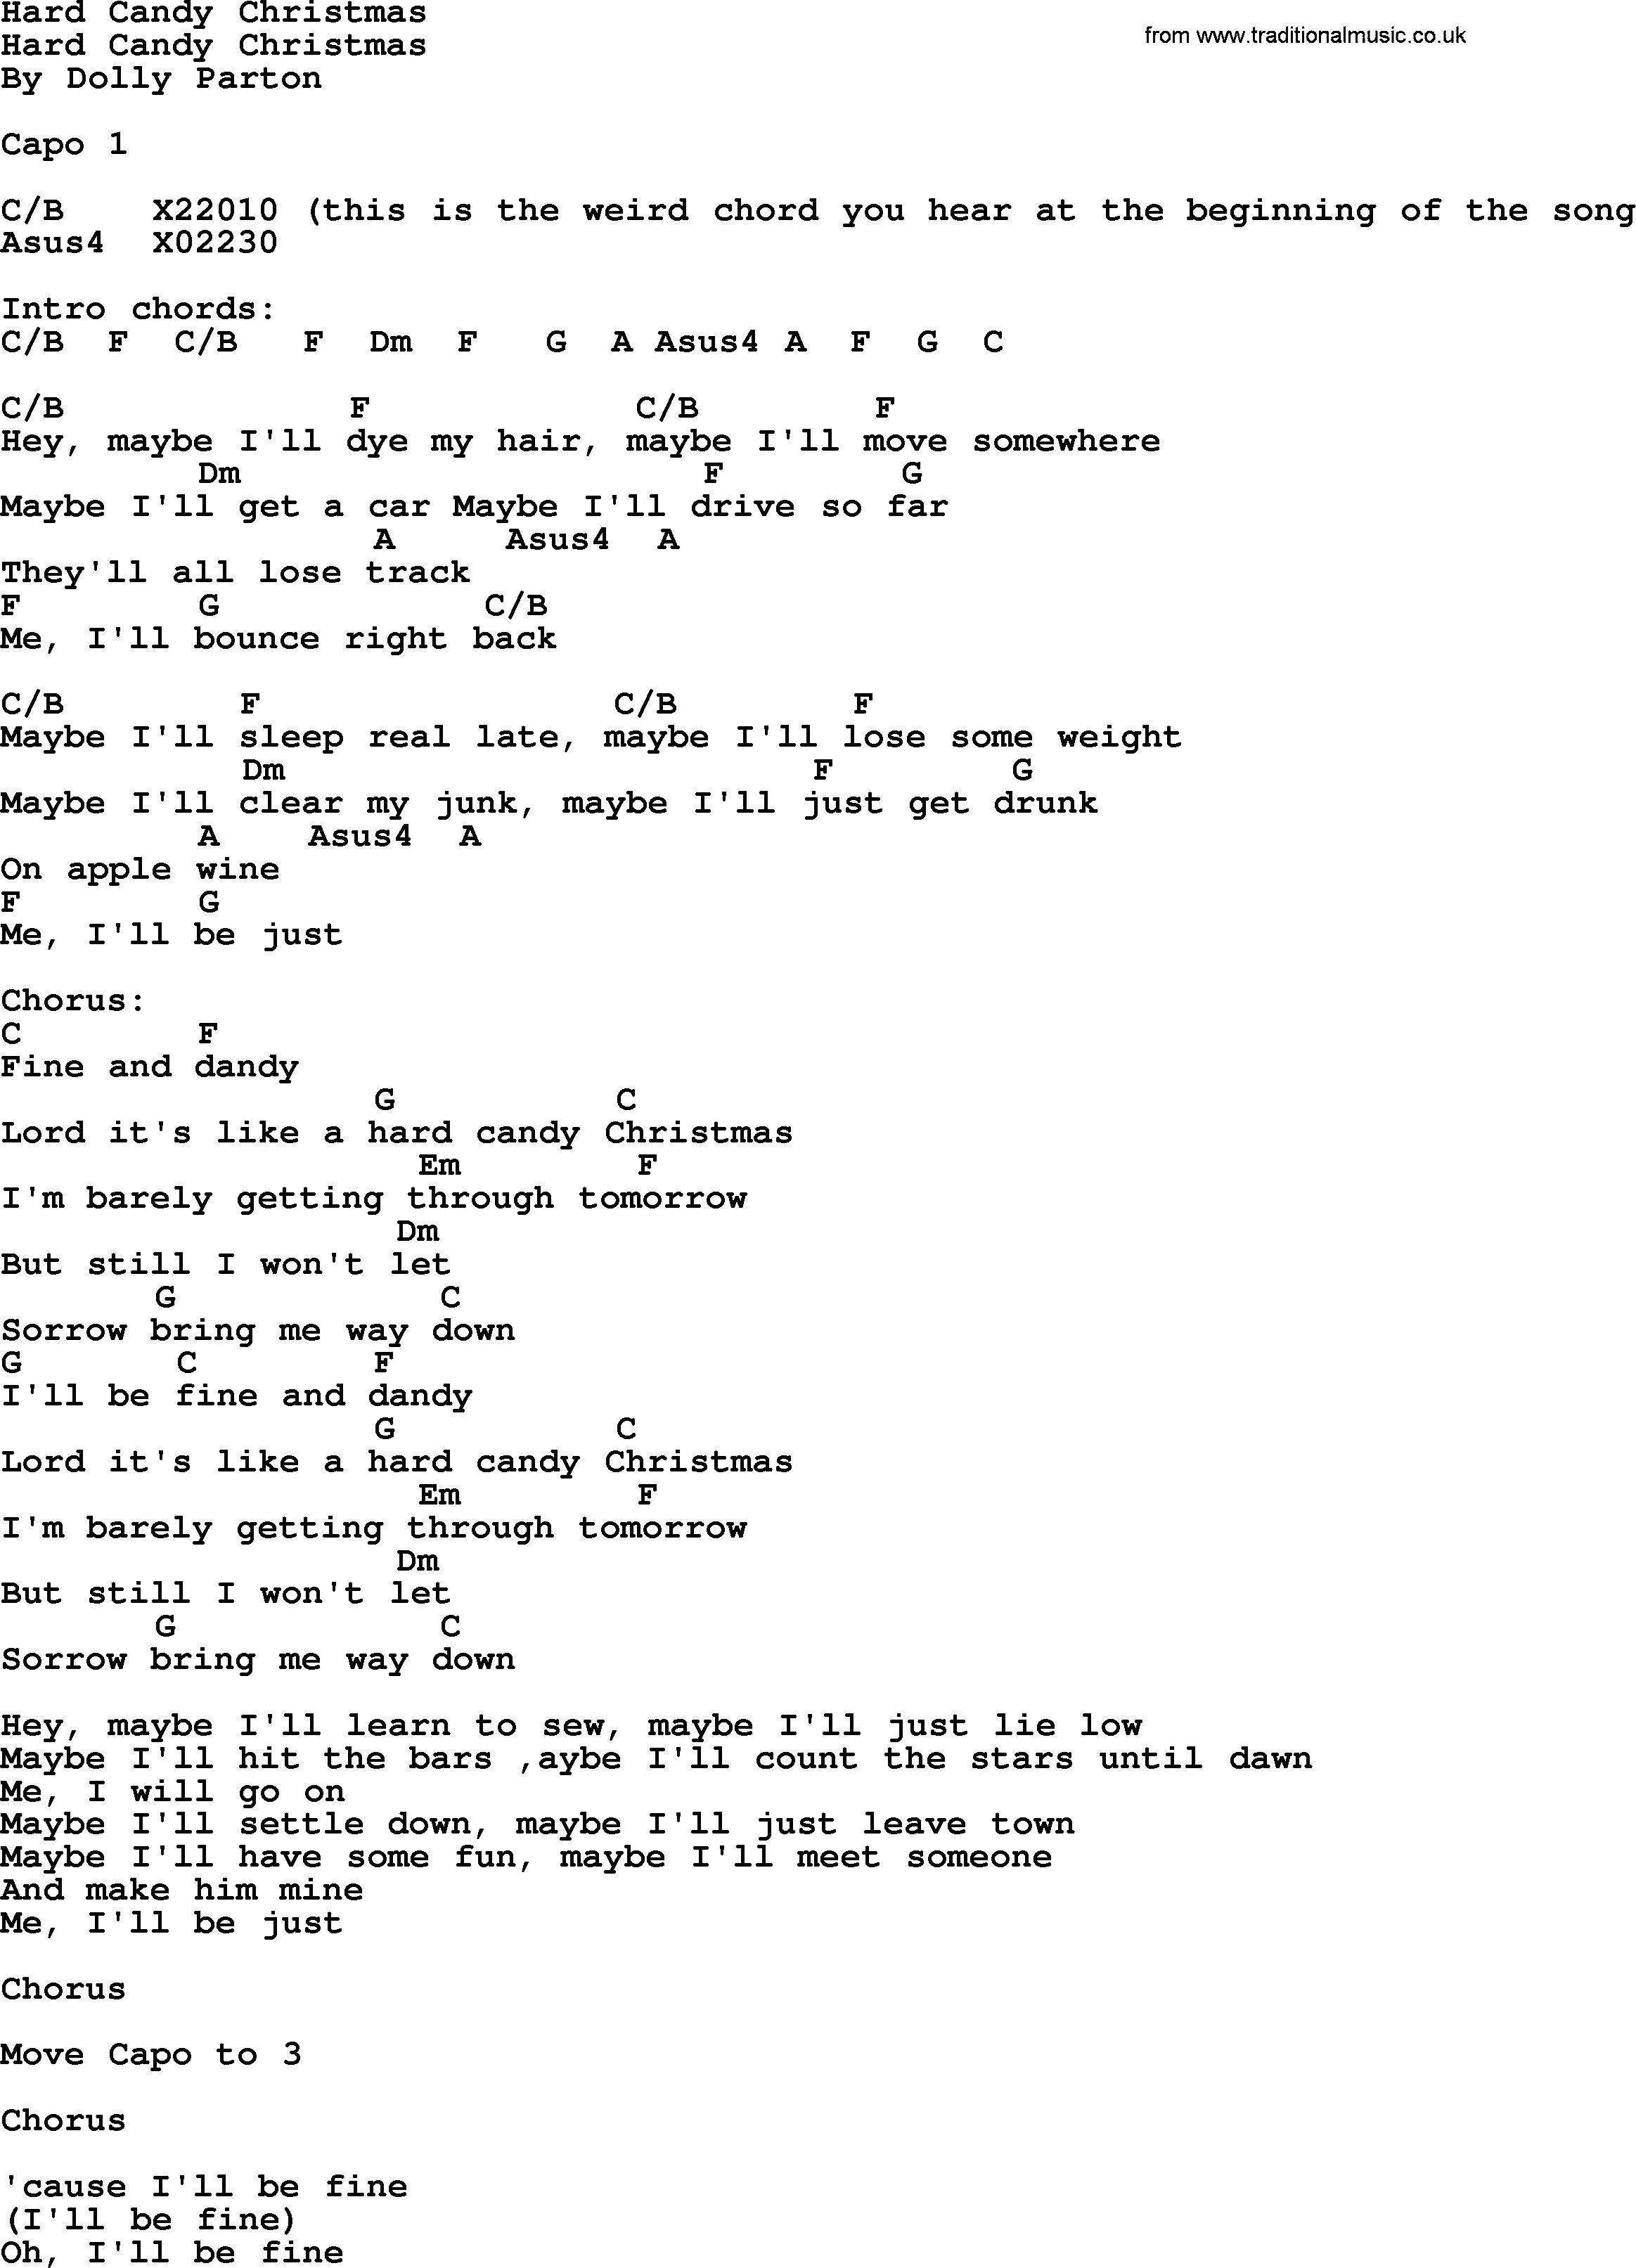 Hard Candy Christmas Chords  Hard Candy Christmas Bluegrass lyrics with chords